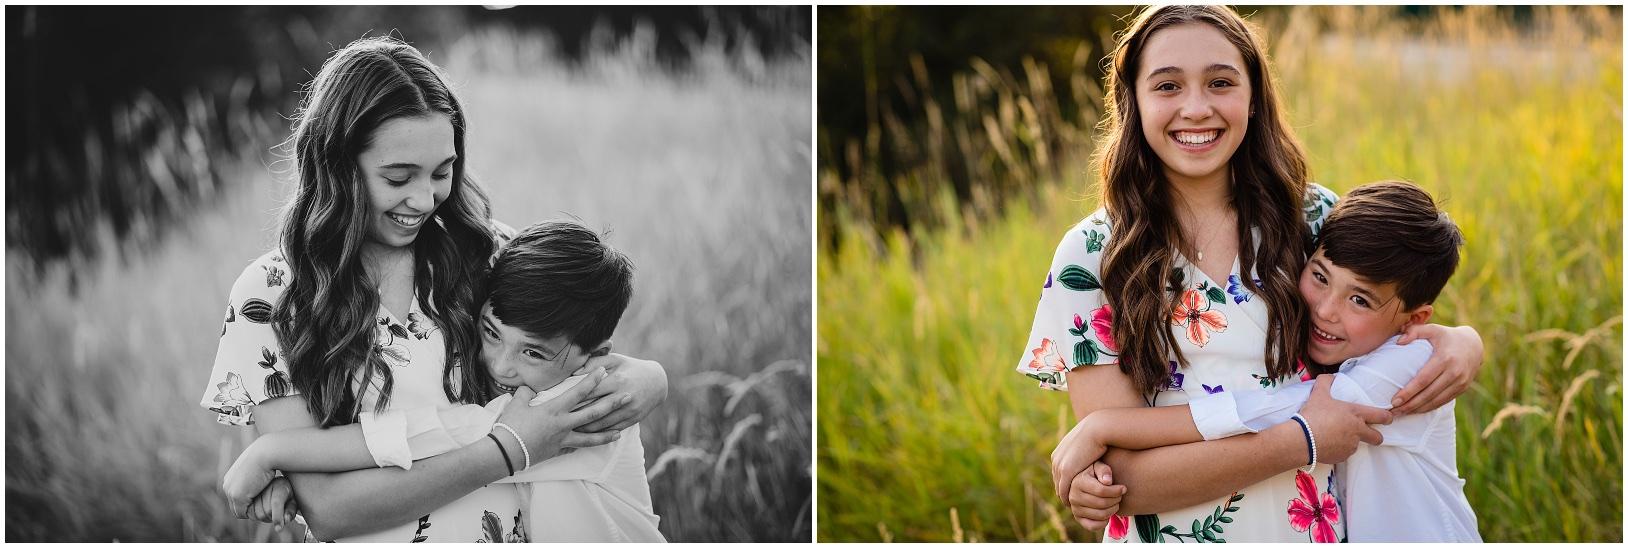 lindseyjanephoto_kids0001.jpg